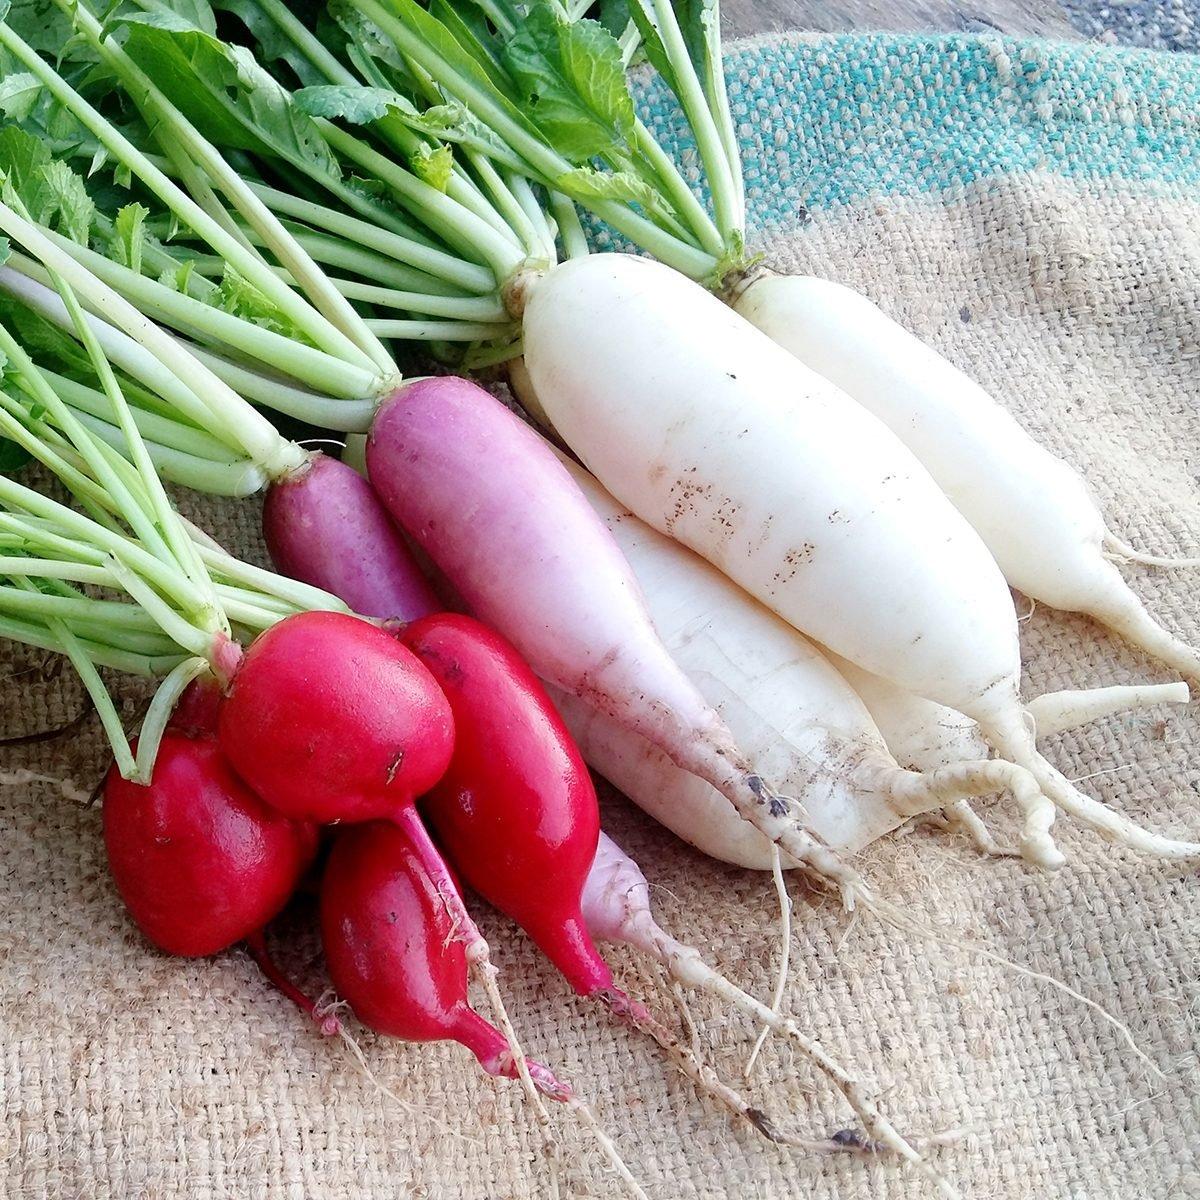 10 Radish Health Benefits You Need to Know